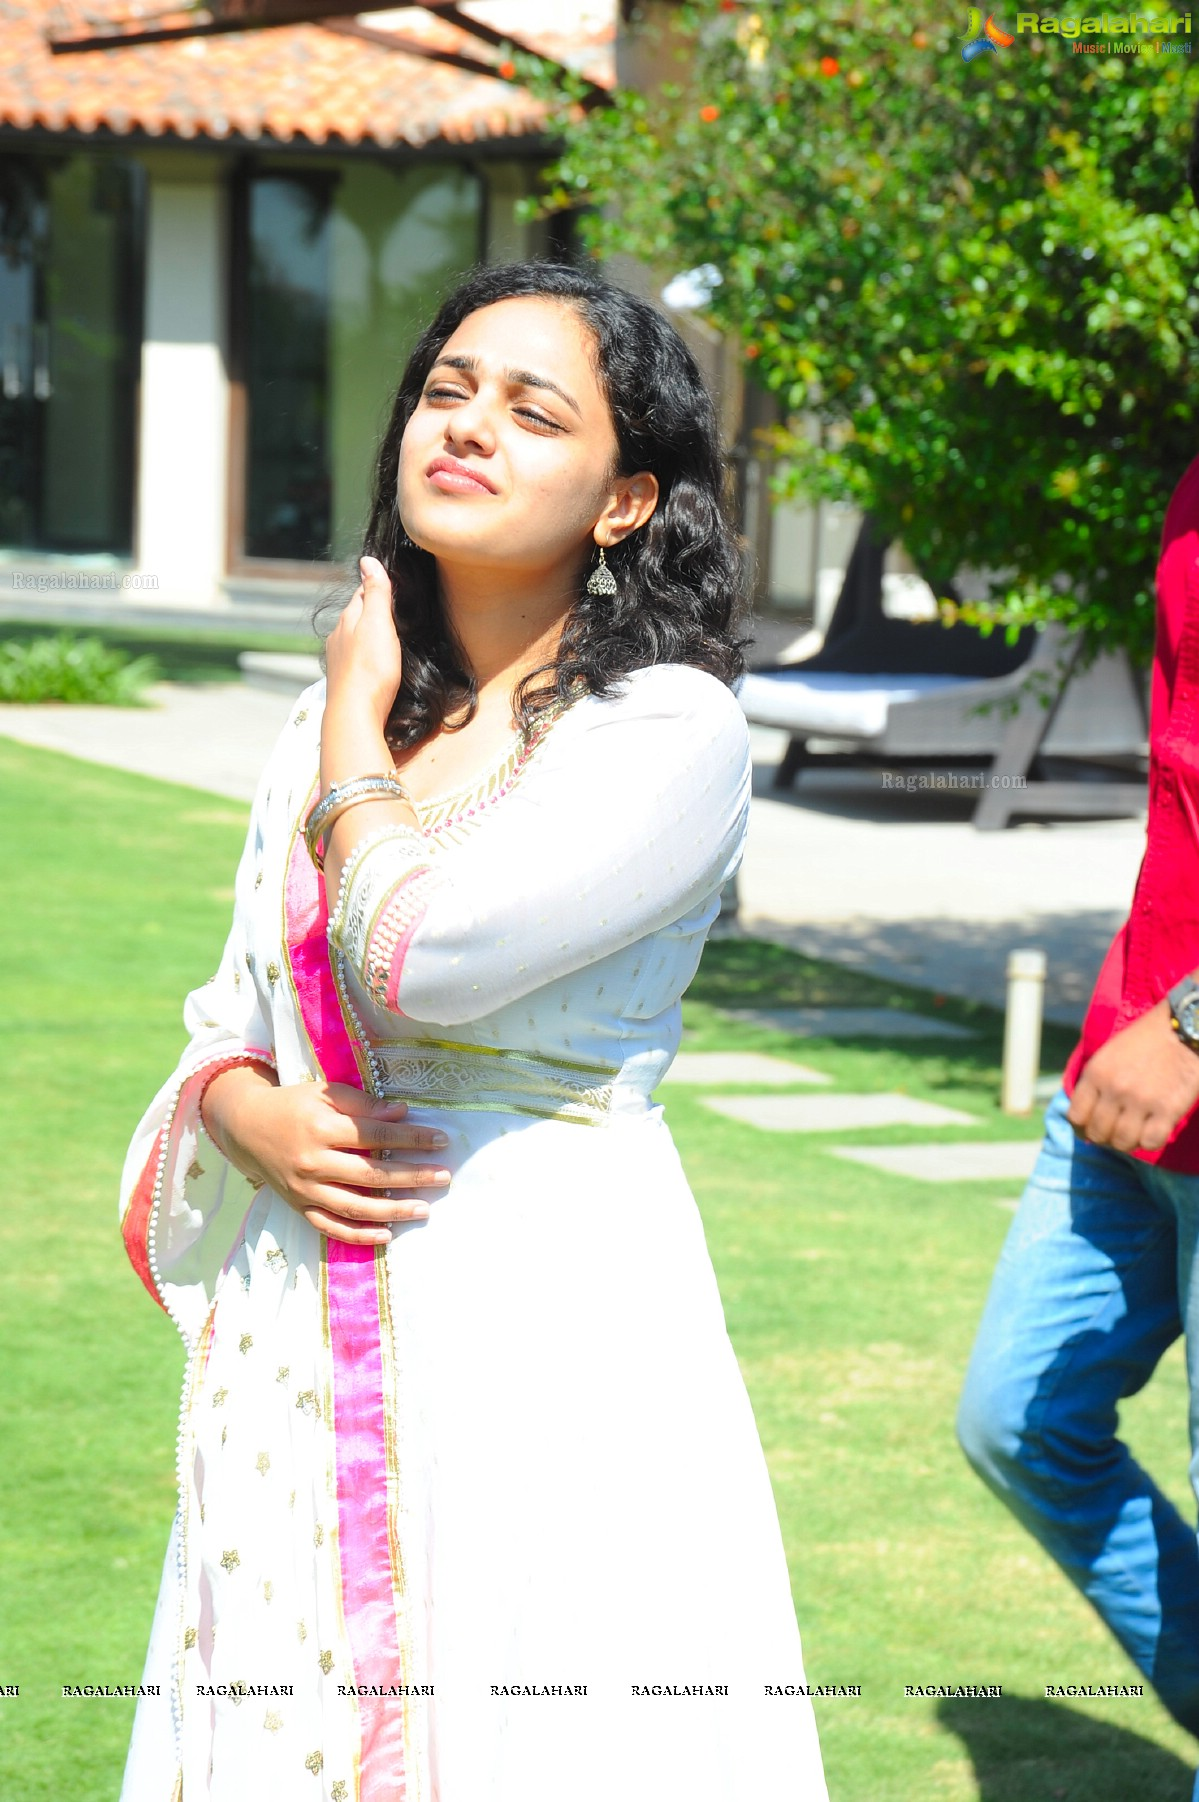 nithya menen image 56   telugu actress hot photos,stills, heroines